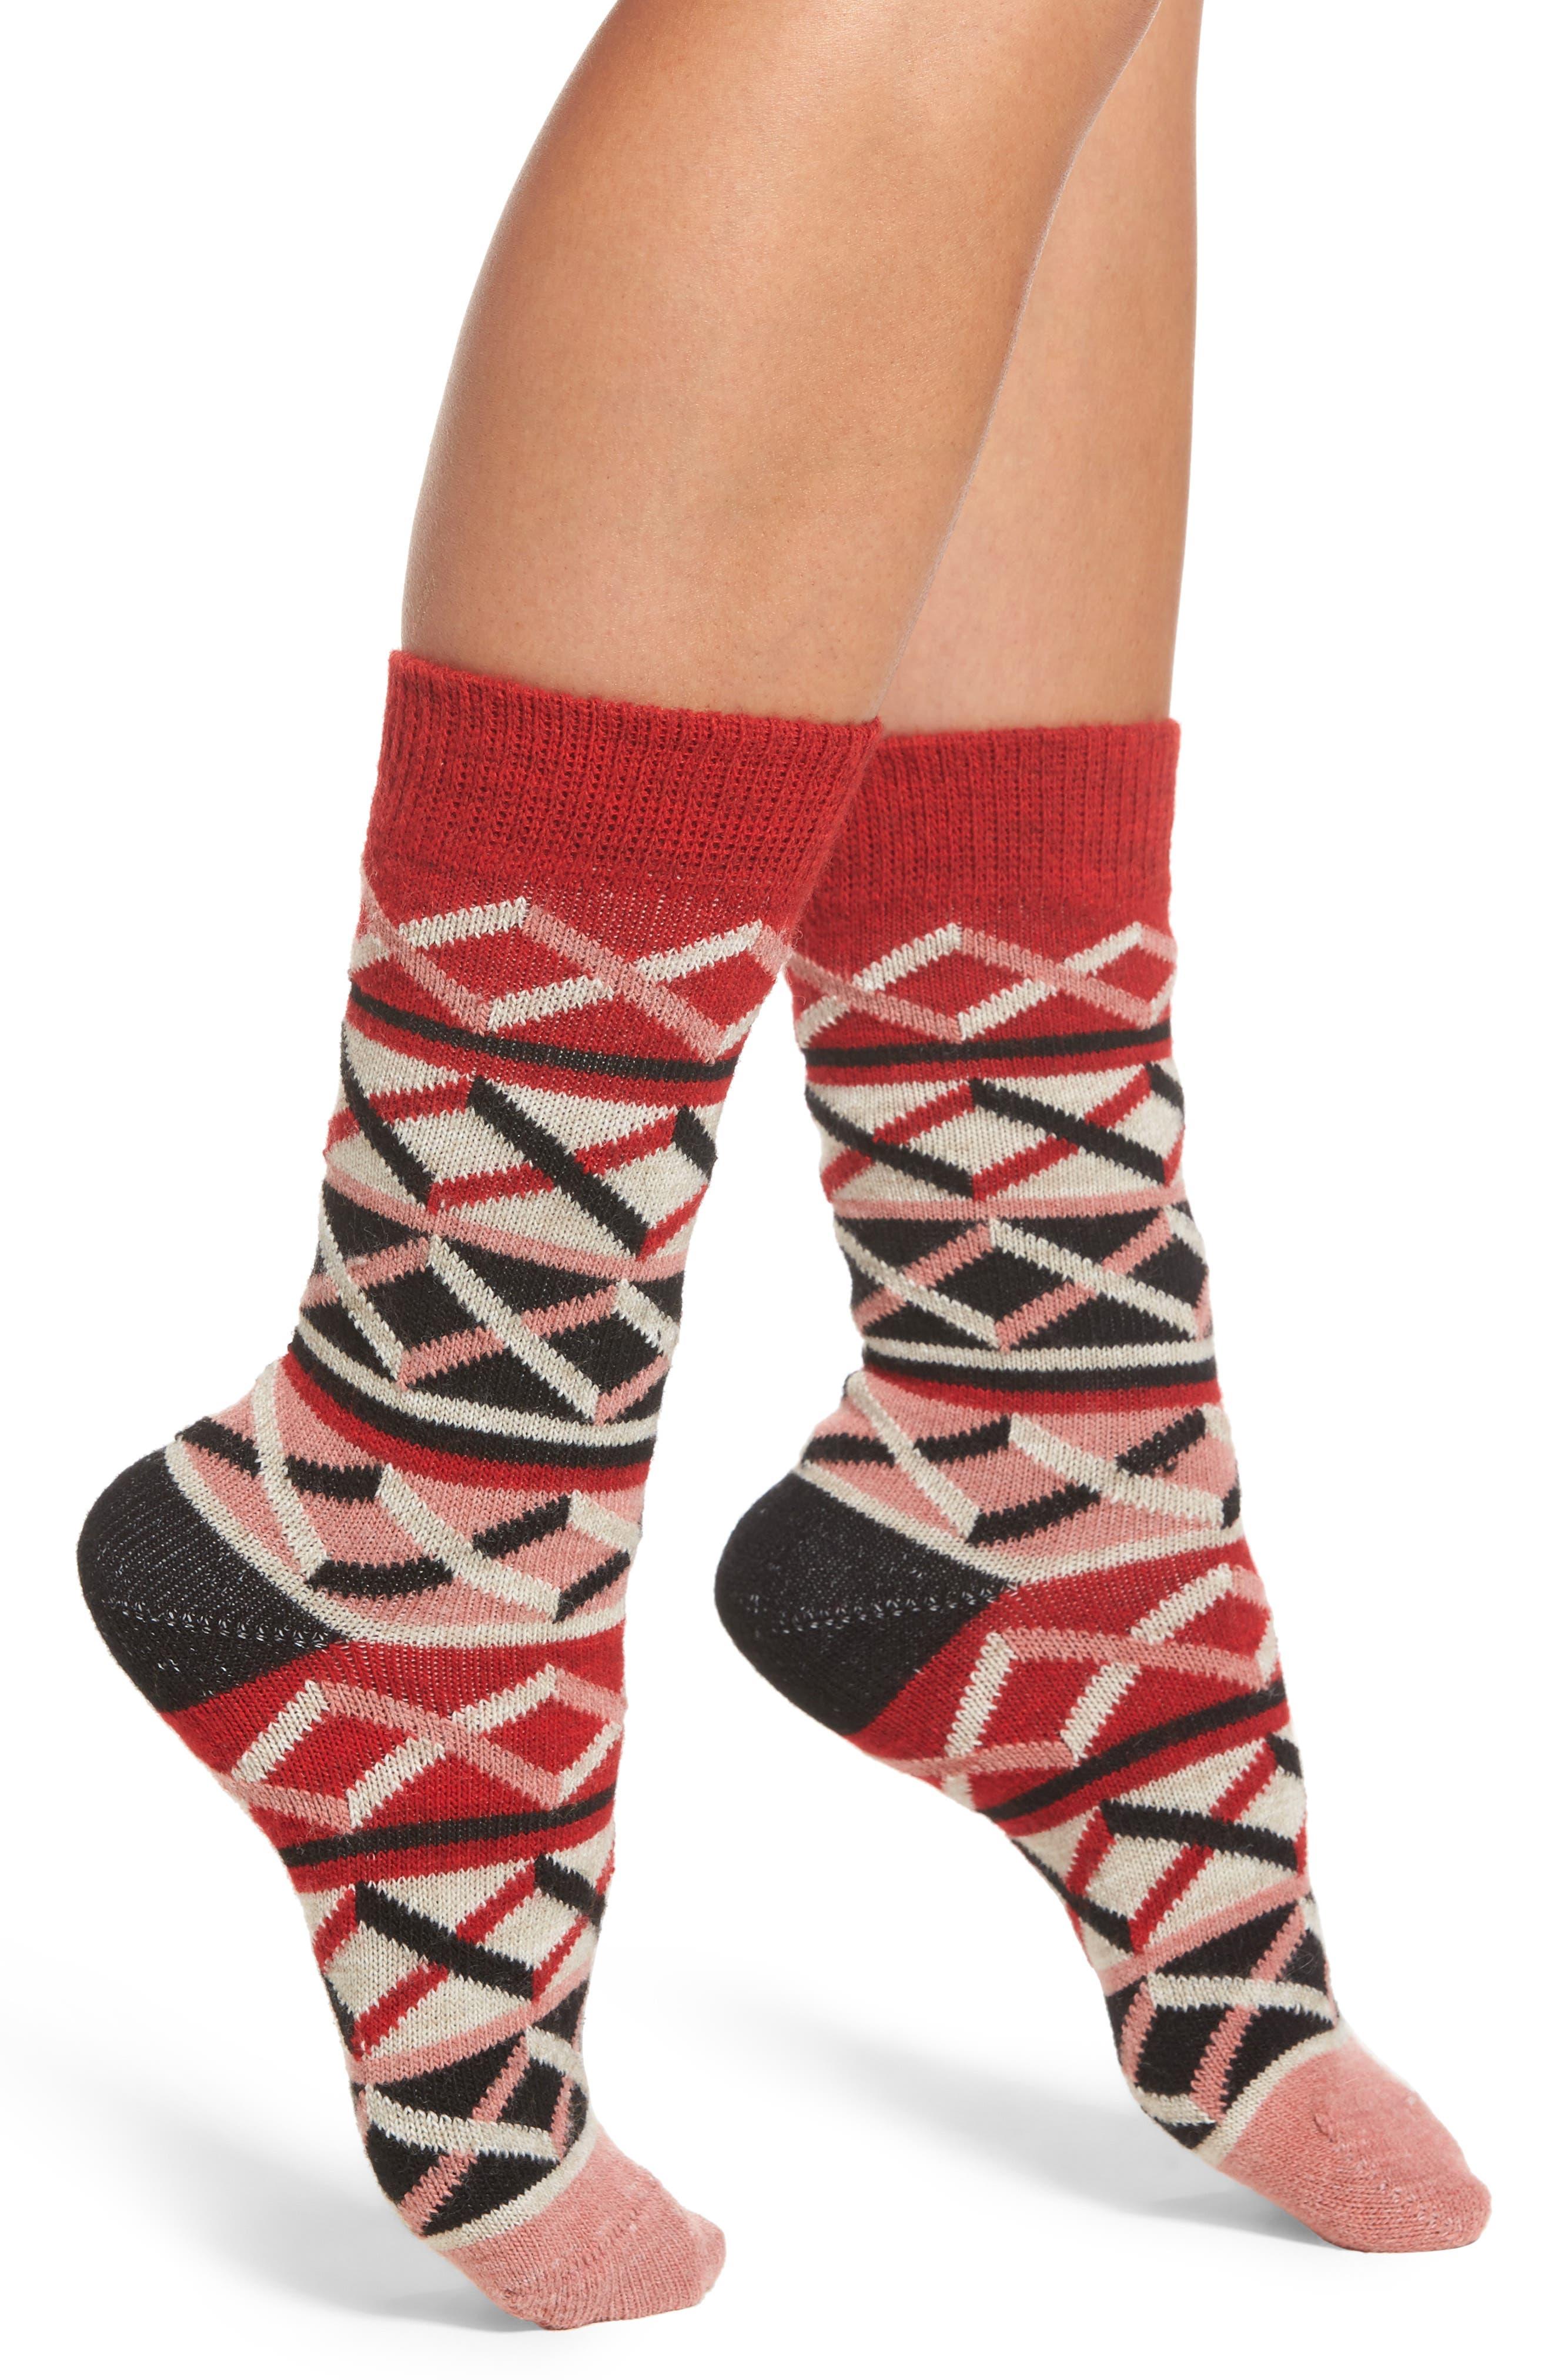 Main Image - Hysteria by Happy Socks Ellinor Crew Socks